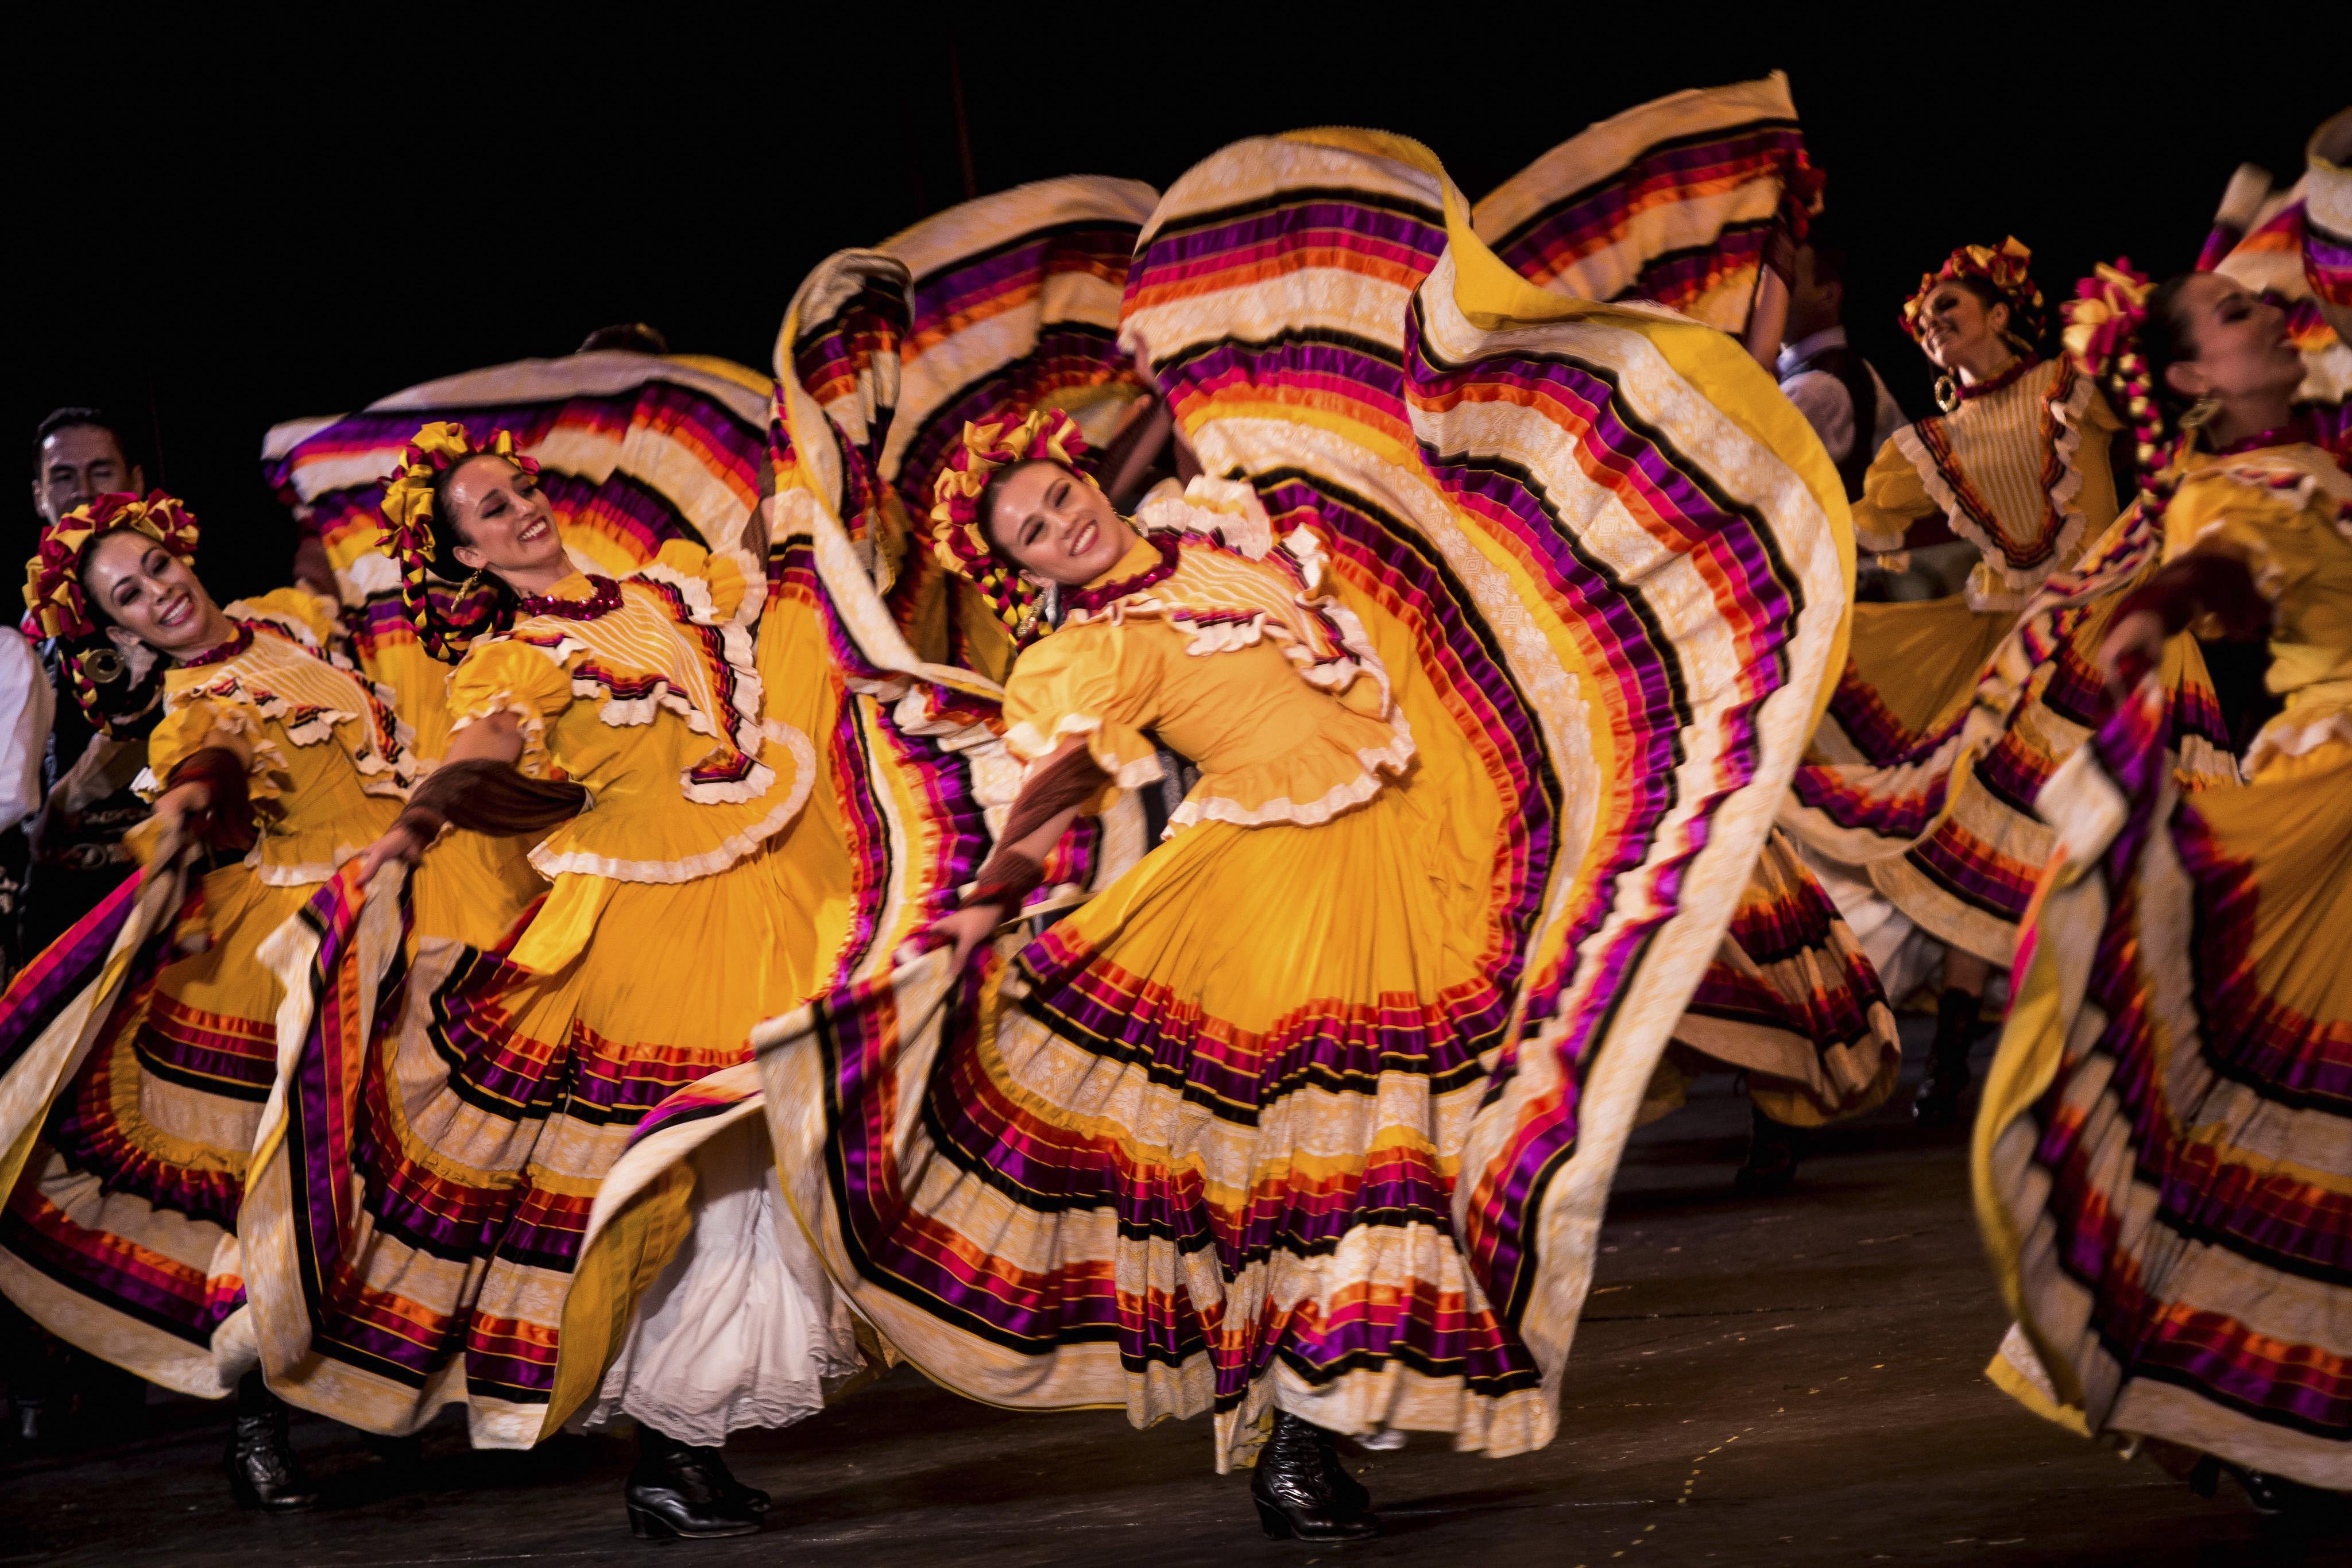 grupo de chicas del ballet en bailable tradicional mexicano